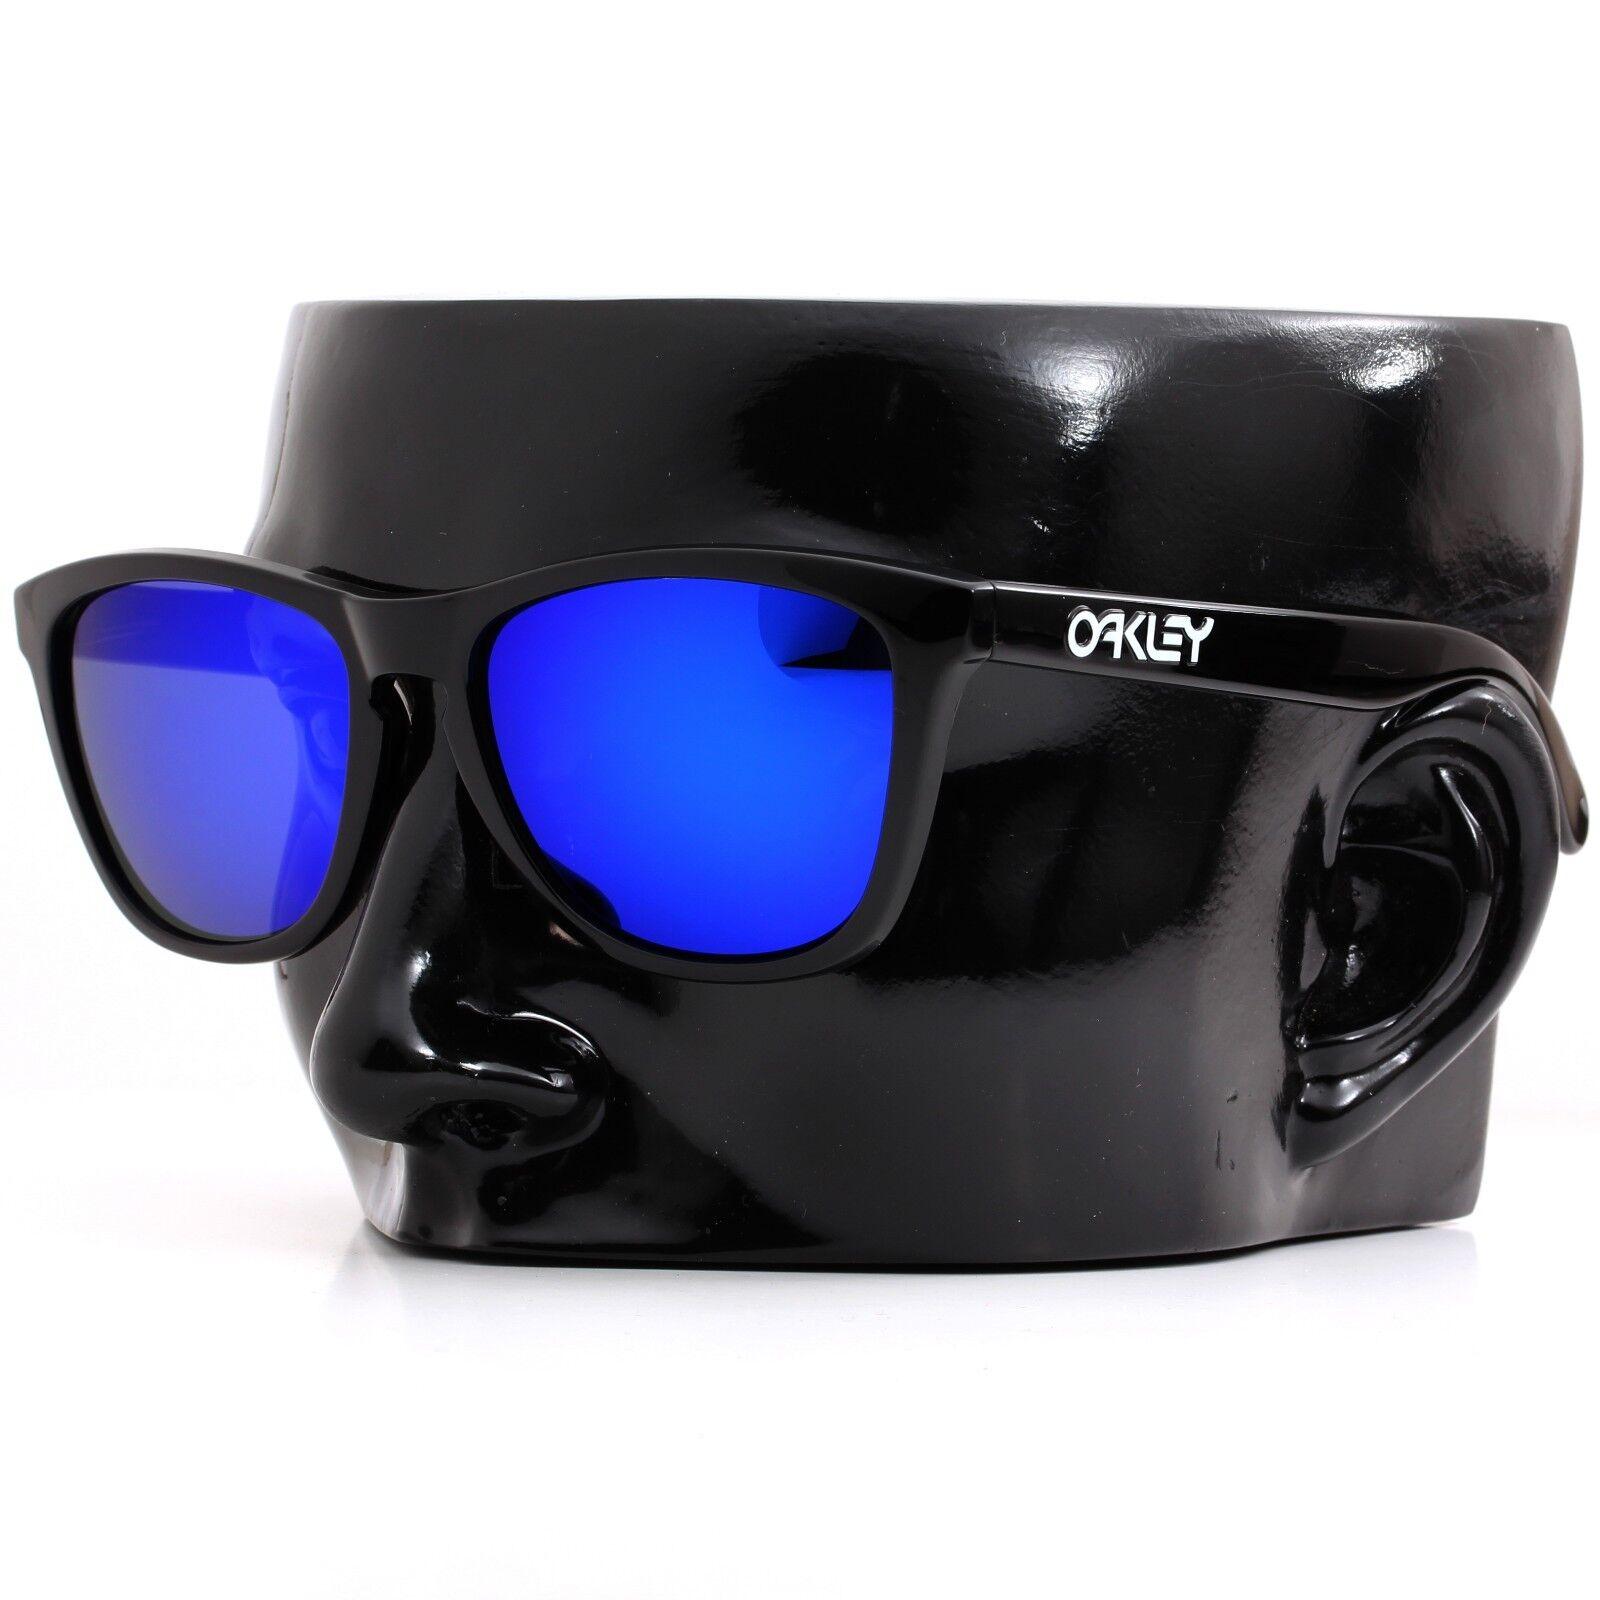 99e778eb02 Polarized IKON Iridium Replacement Lenses For Oakley Frogskins Deep Blue